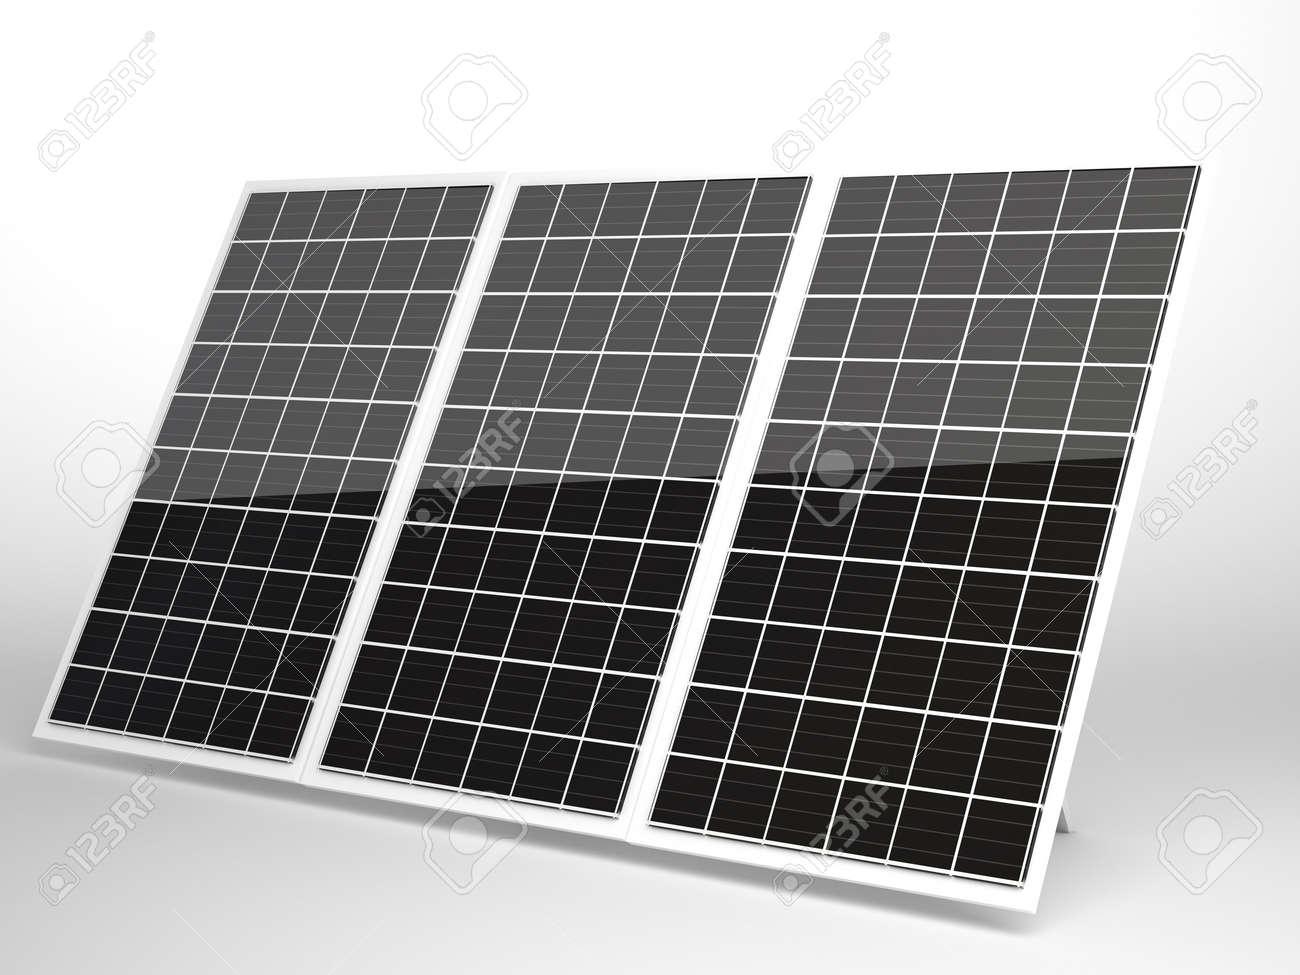 solar panel Stock Photo - 16774283